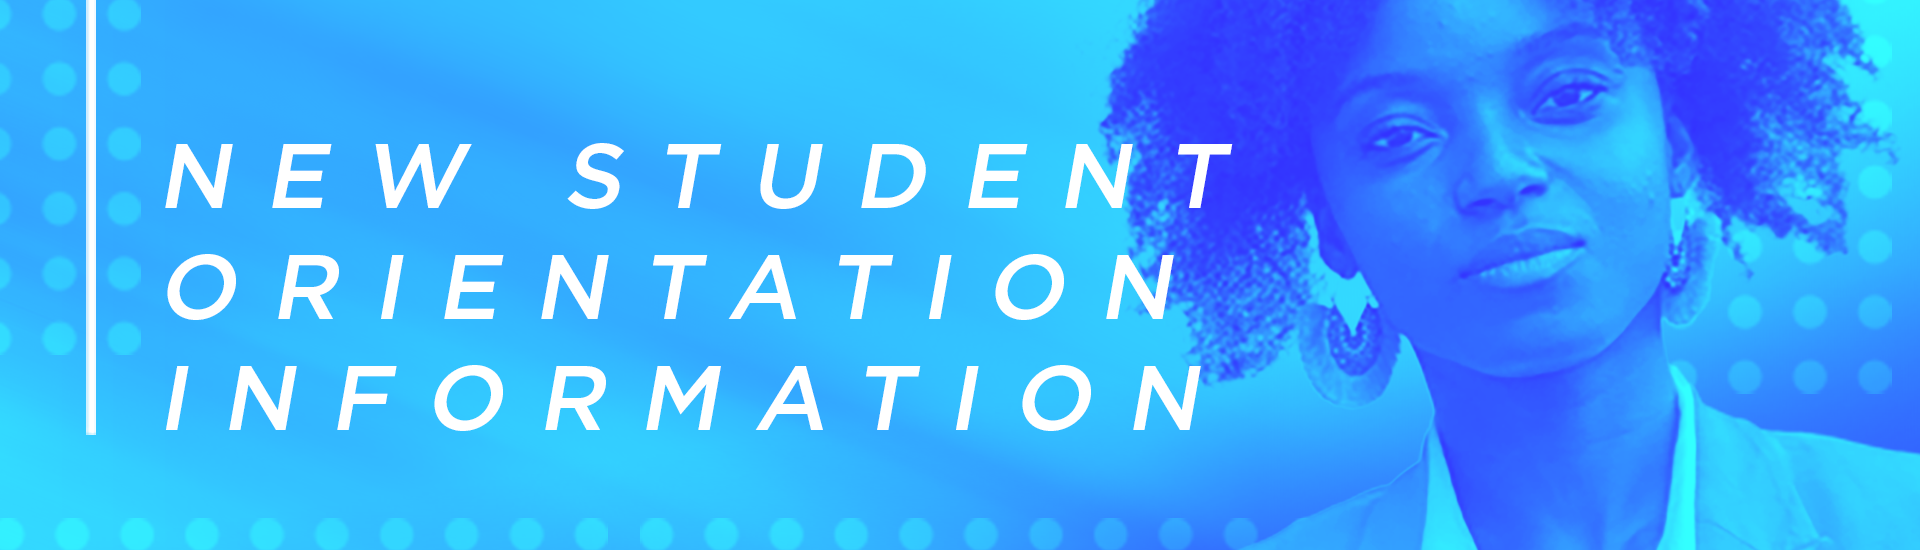 New student orientation information